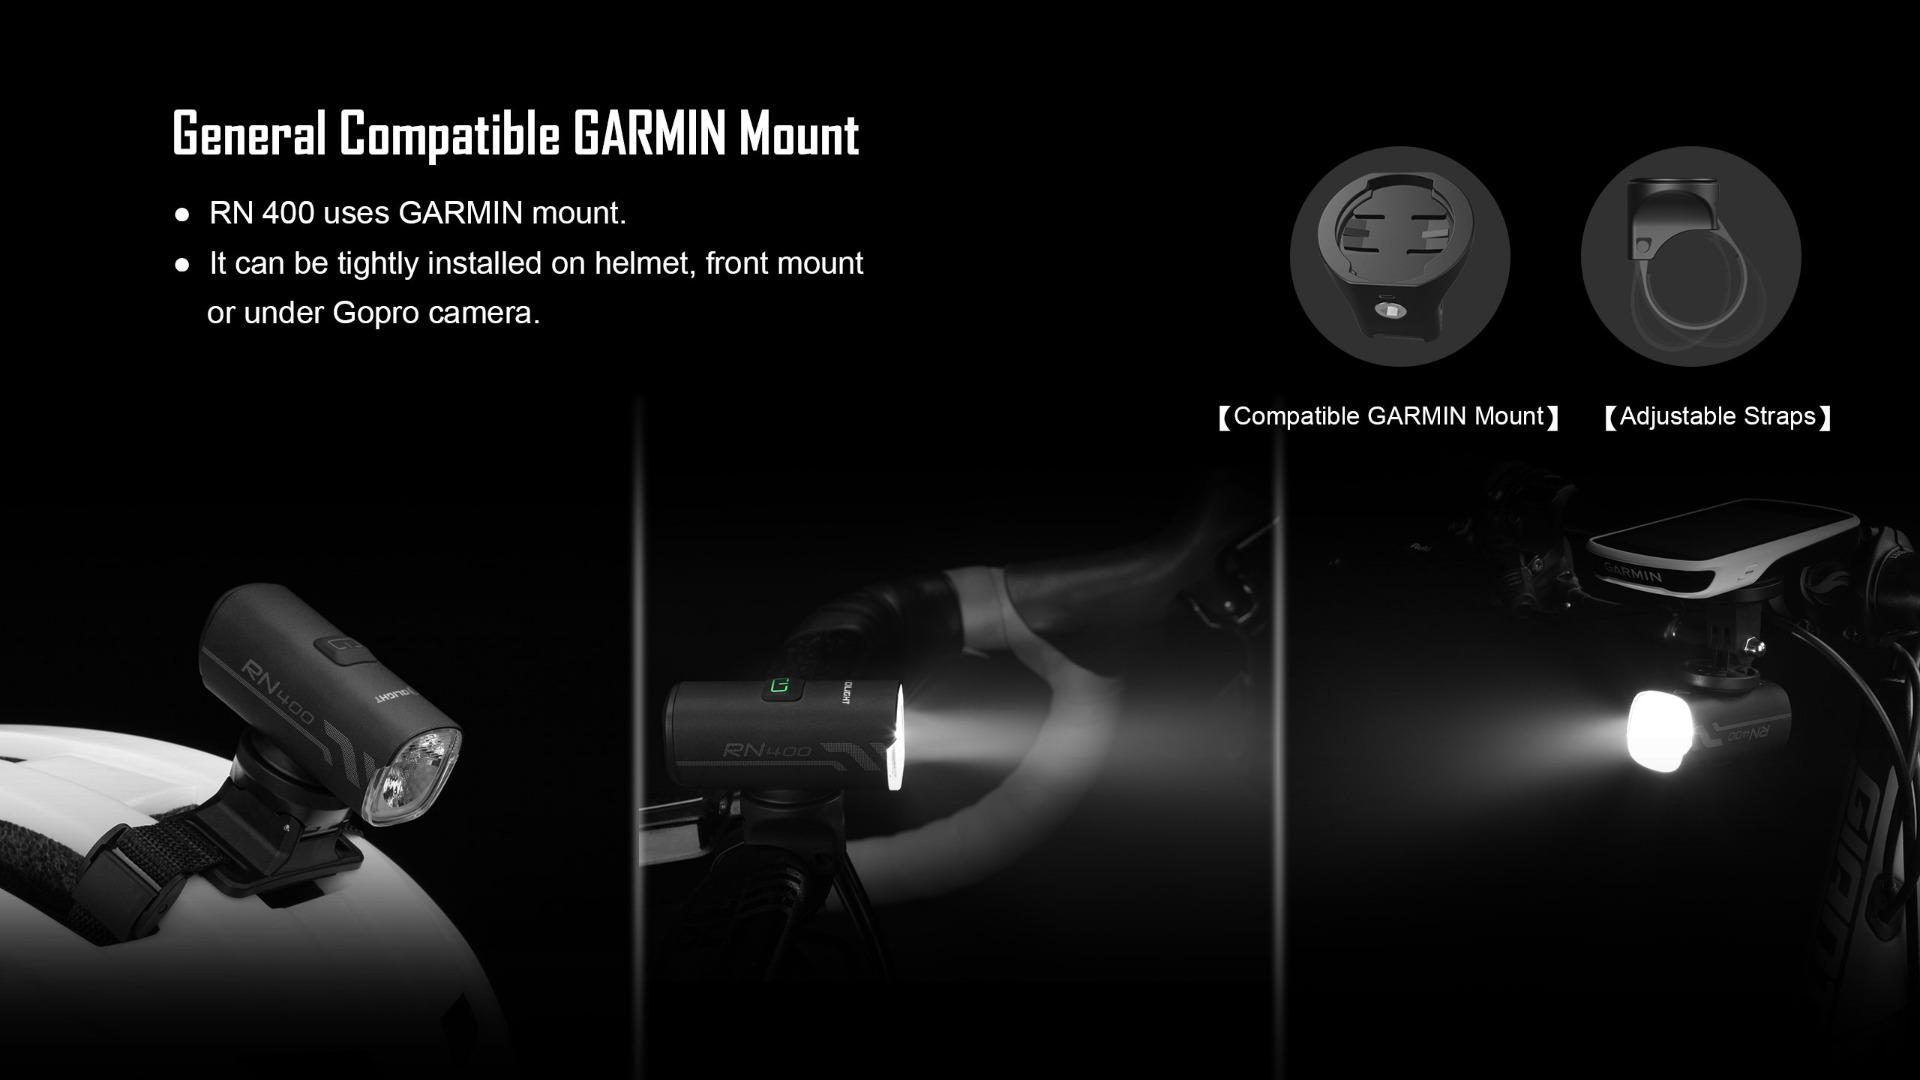 Olight RN 400 Bike LED Light Headlight Garmin Mount